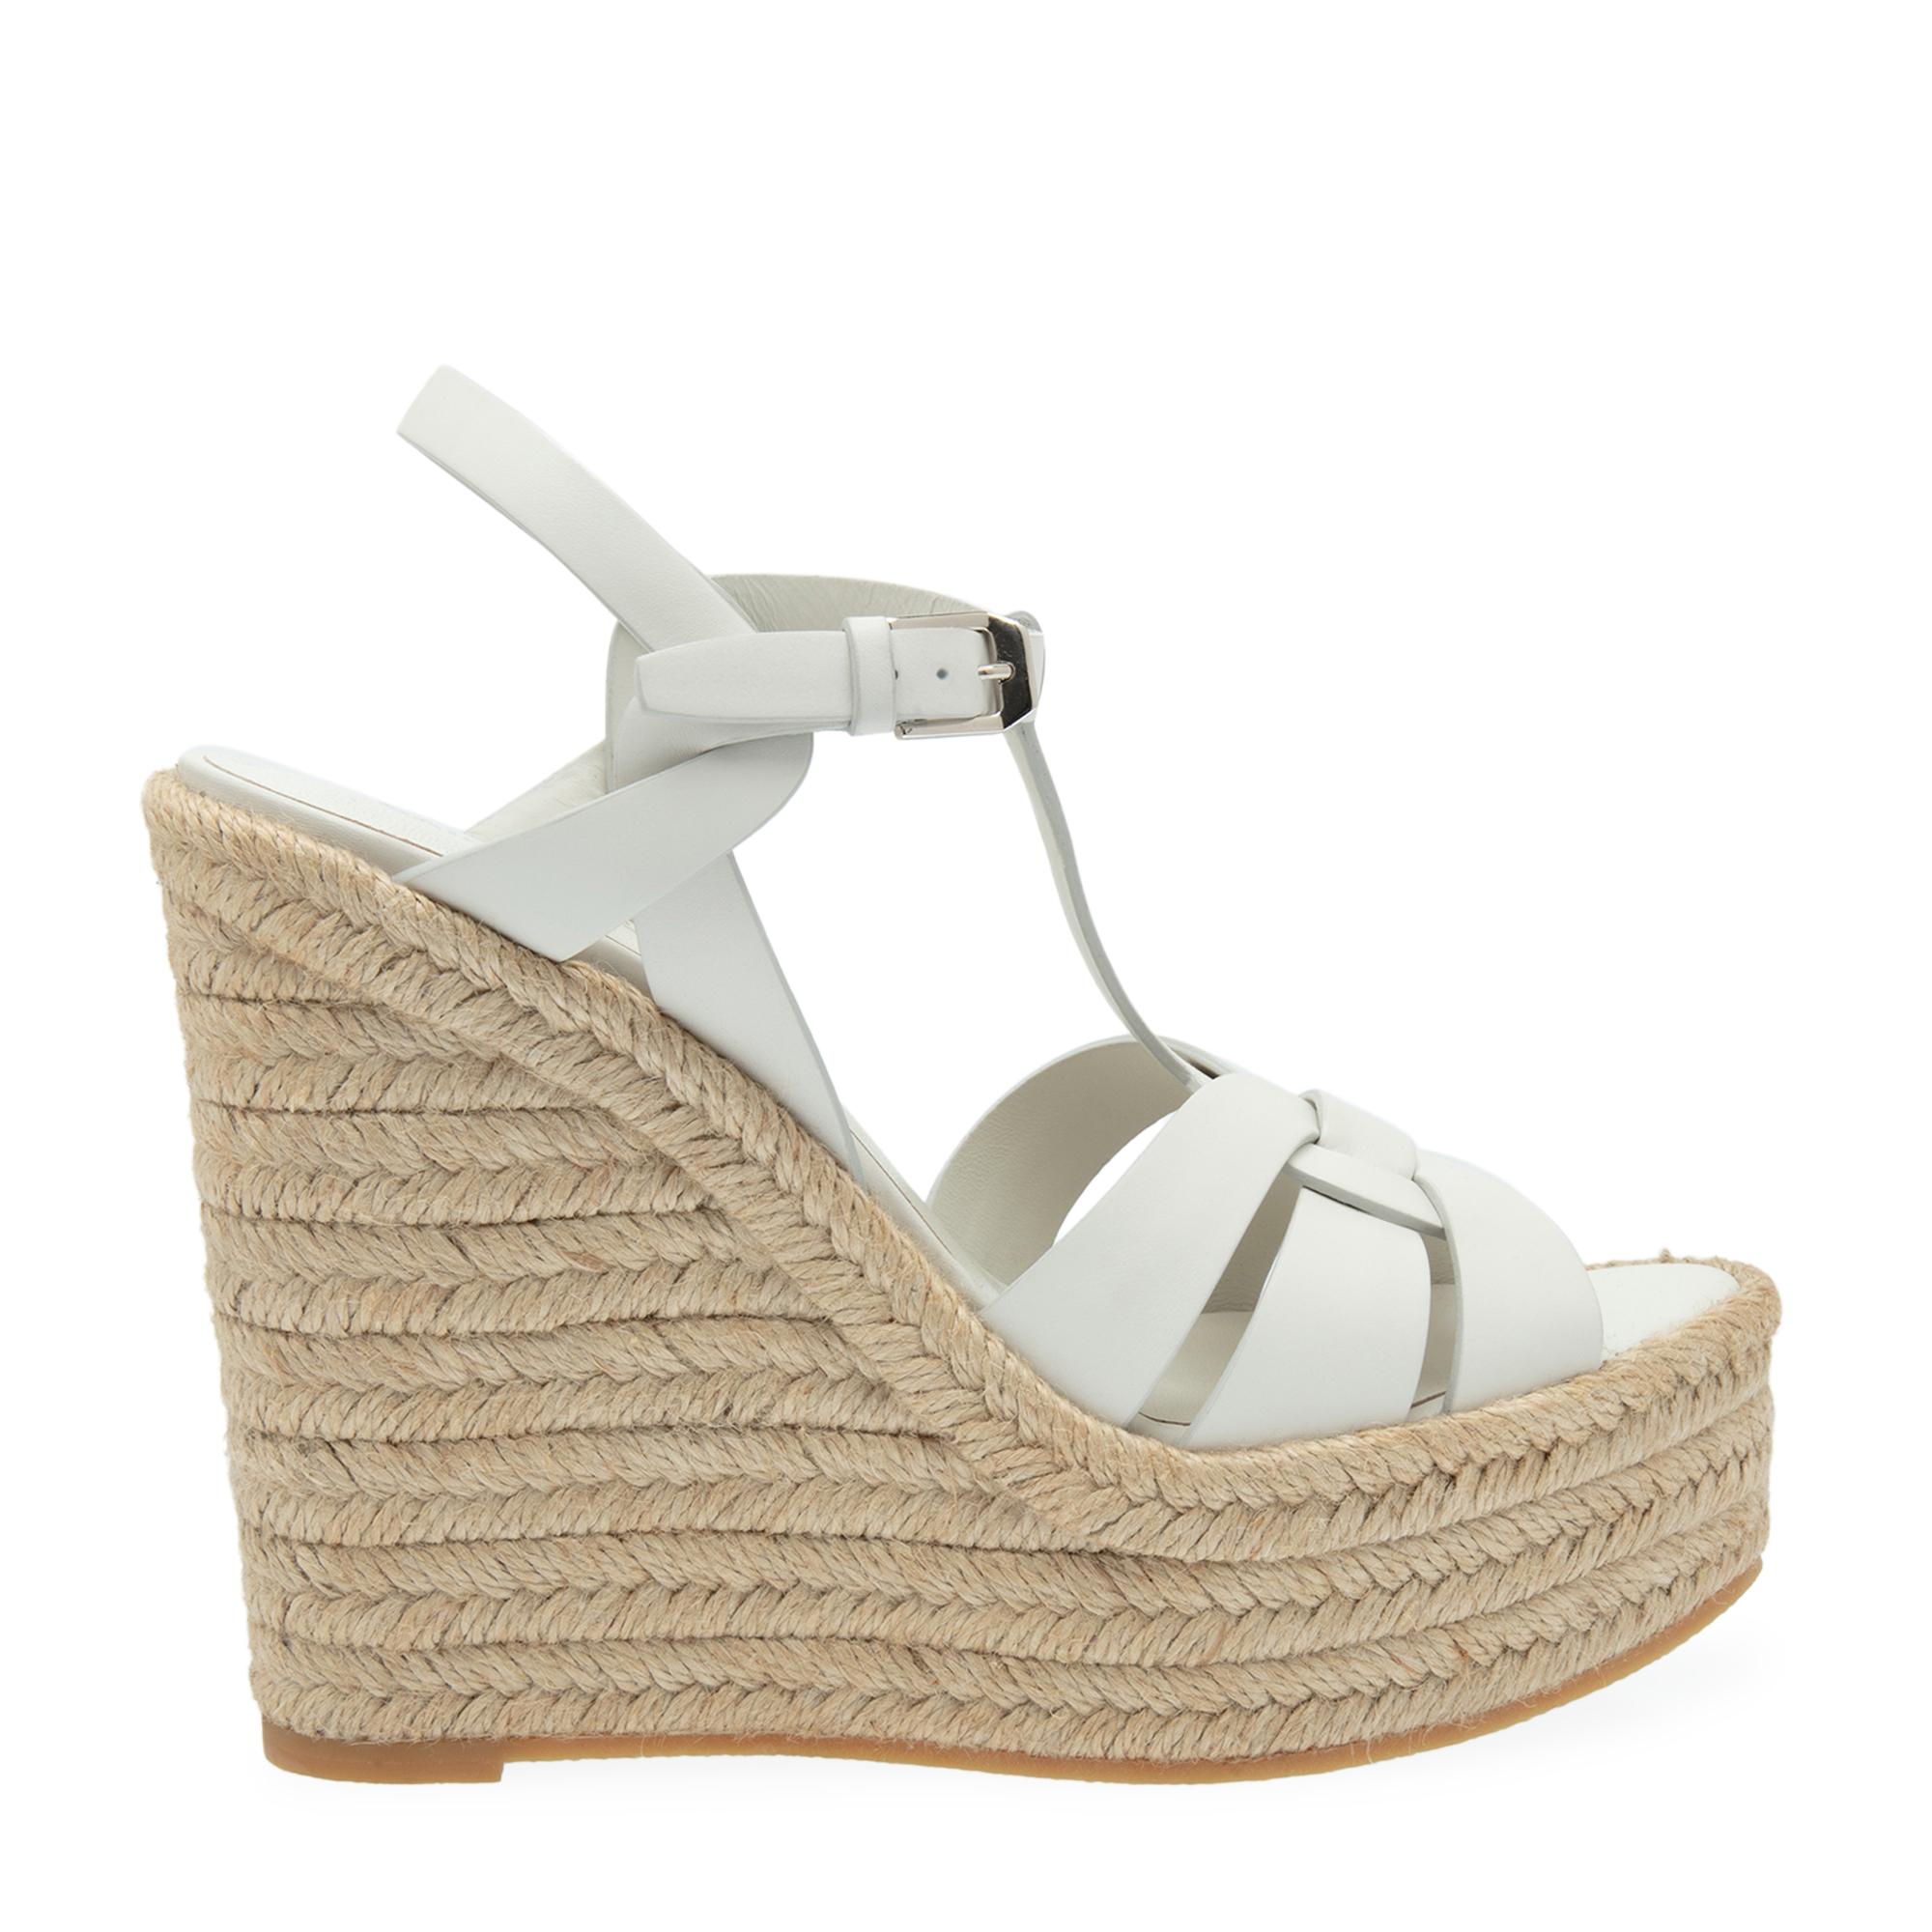 Tribute wedge sandals